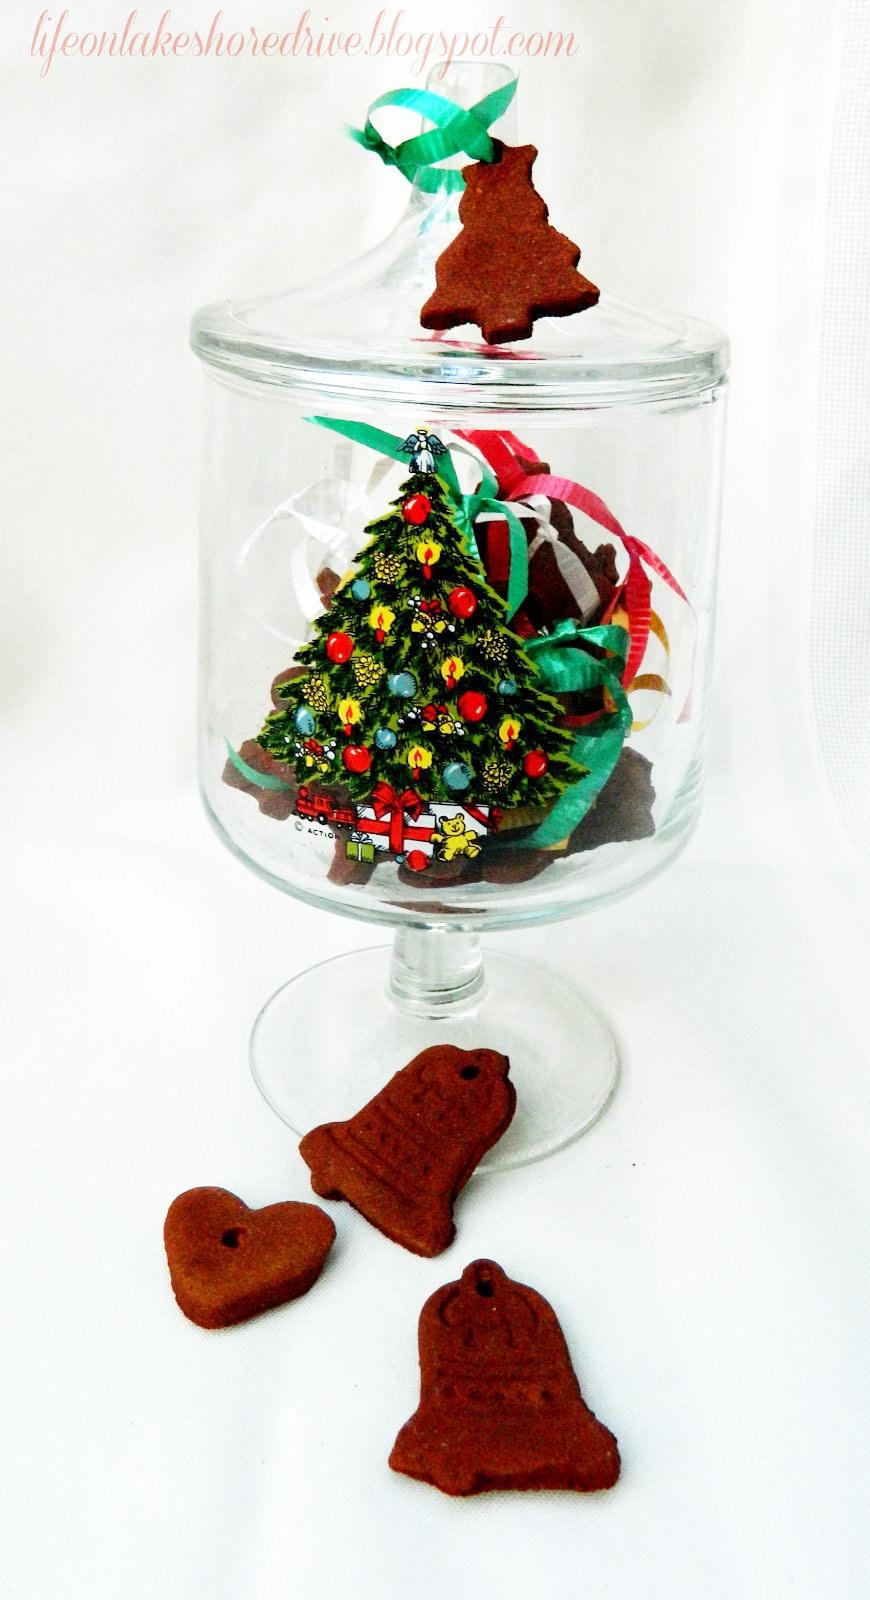 12 Days of Christmas Day 8 {Cinnamon Applesauce Ornaments}